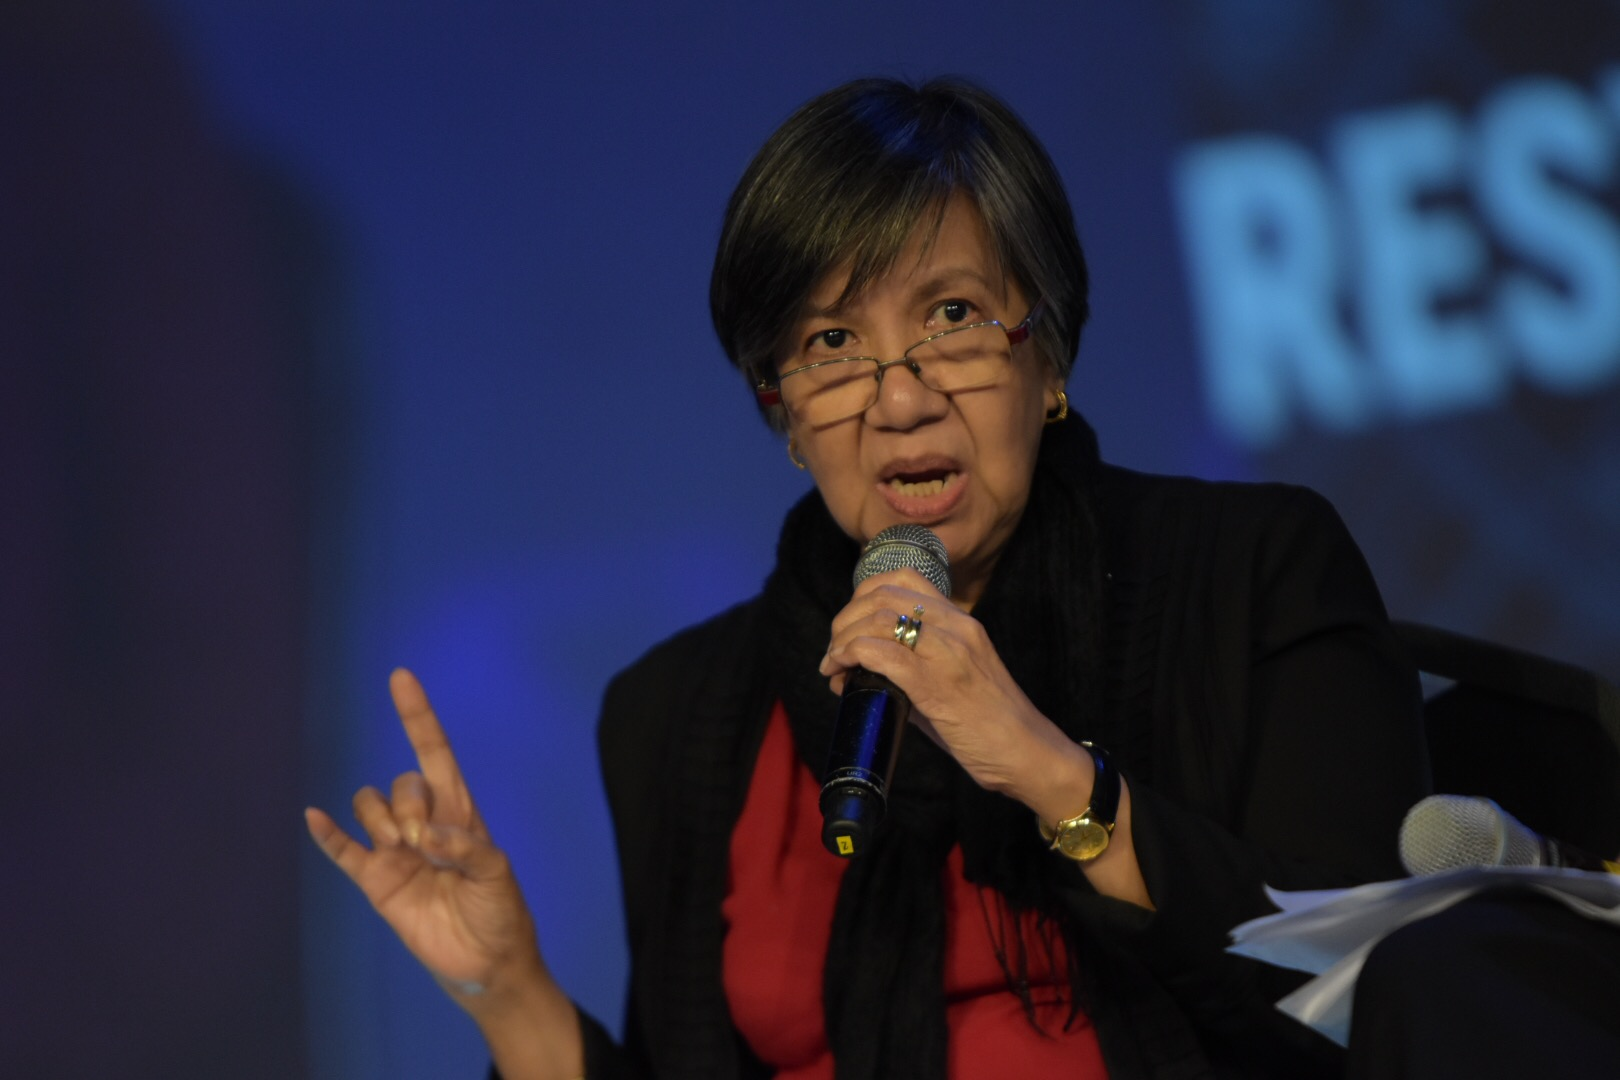 DEFENDING THE MEDIA. CMFR executive director Melinda Quintos-de Jesus discusses the effort to discredit Filipino journalists. Photo by LeAnne Jazul/Rappler